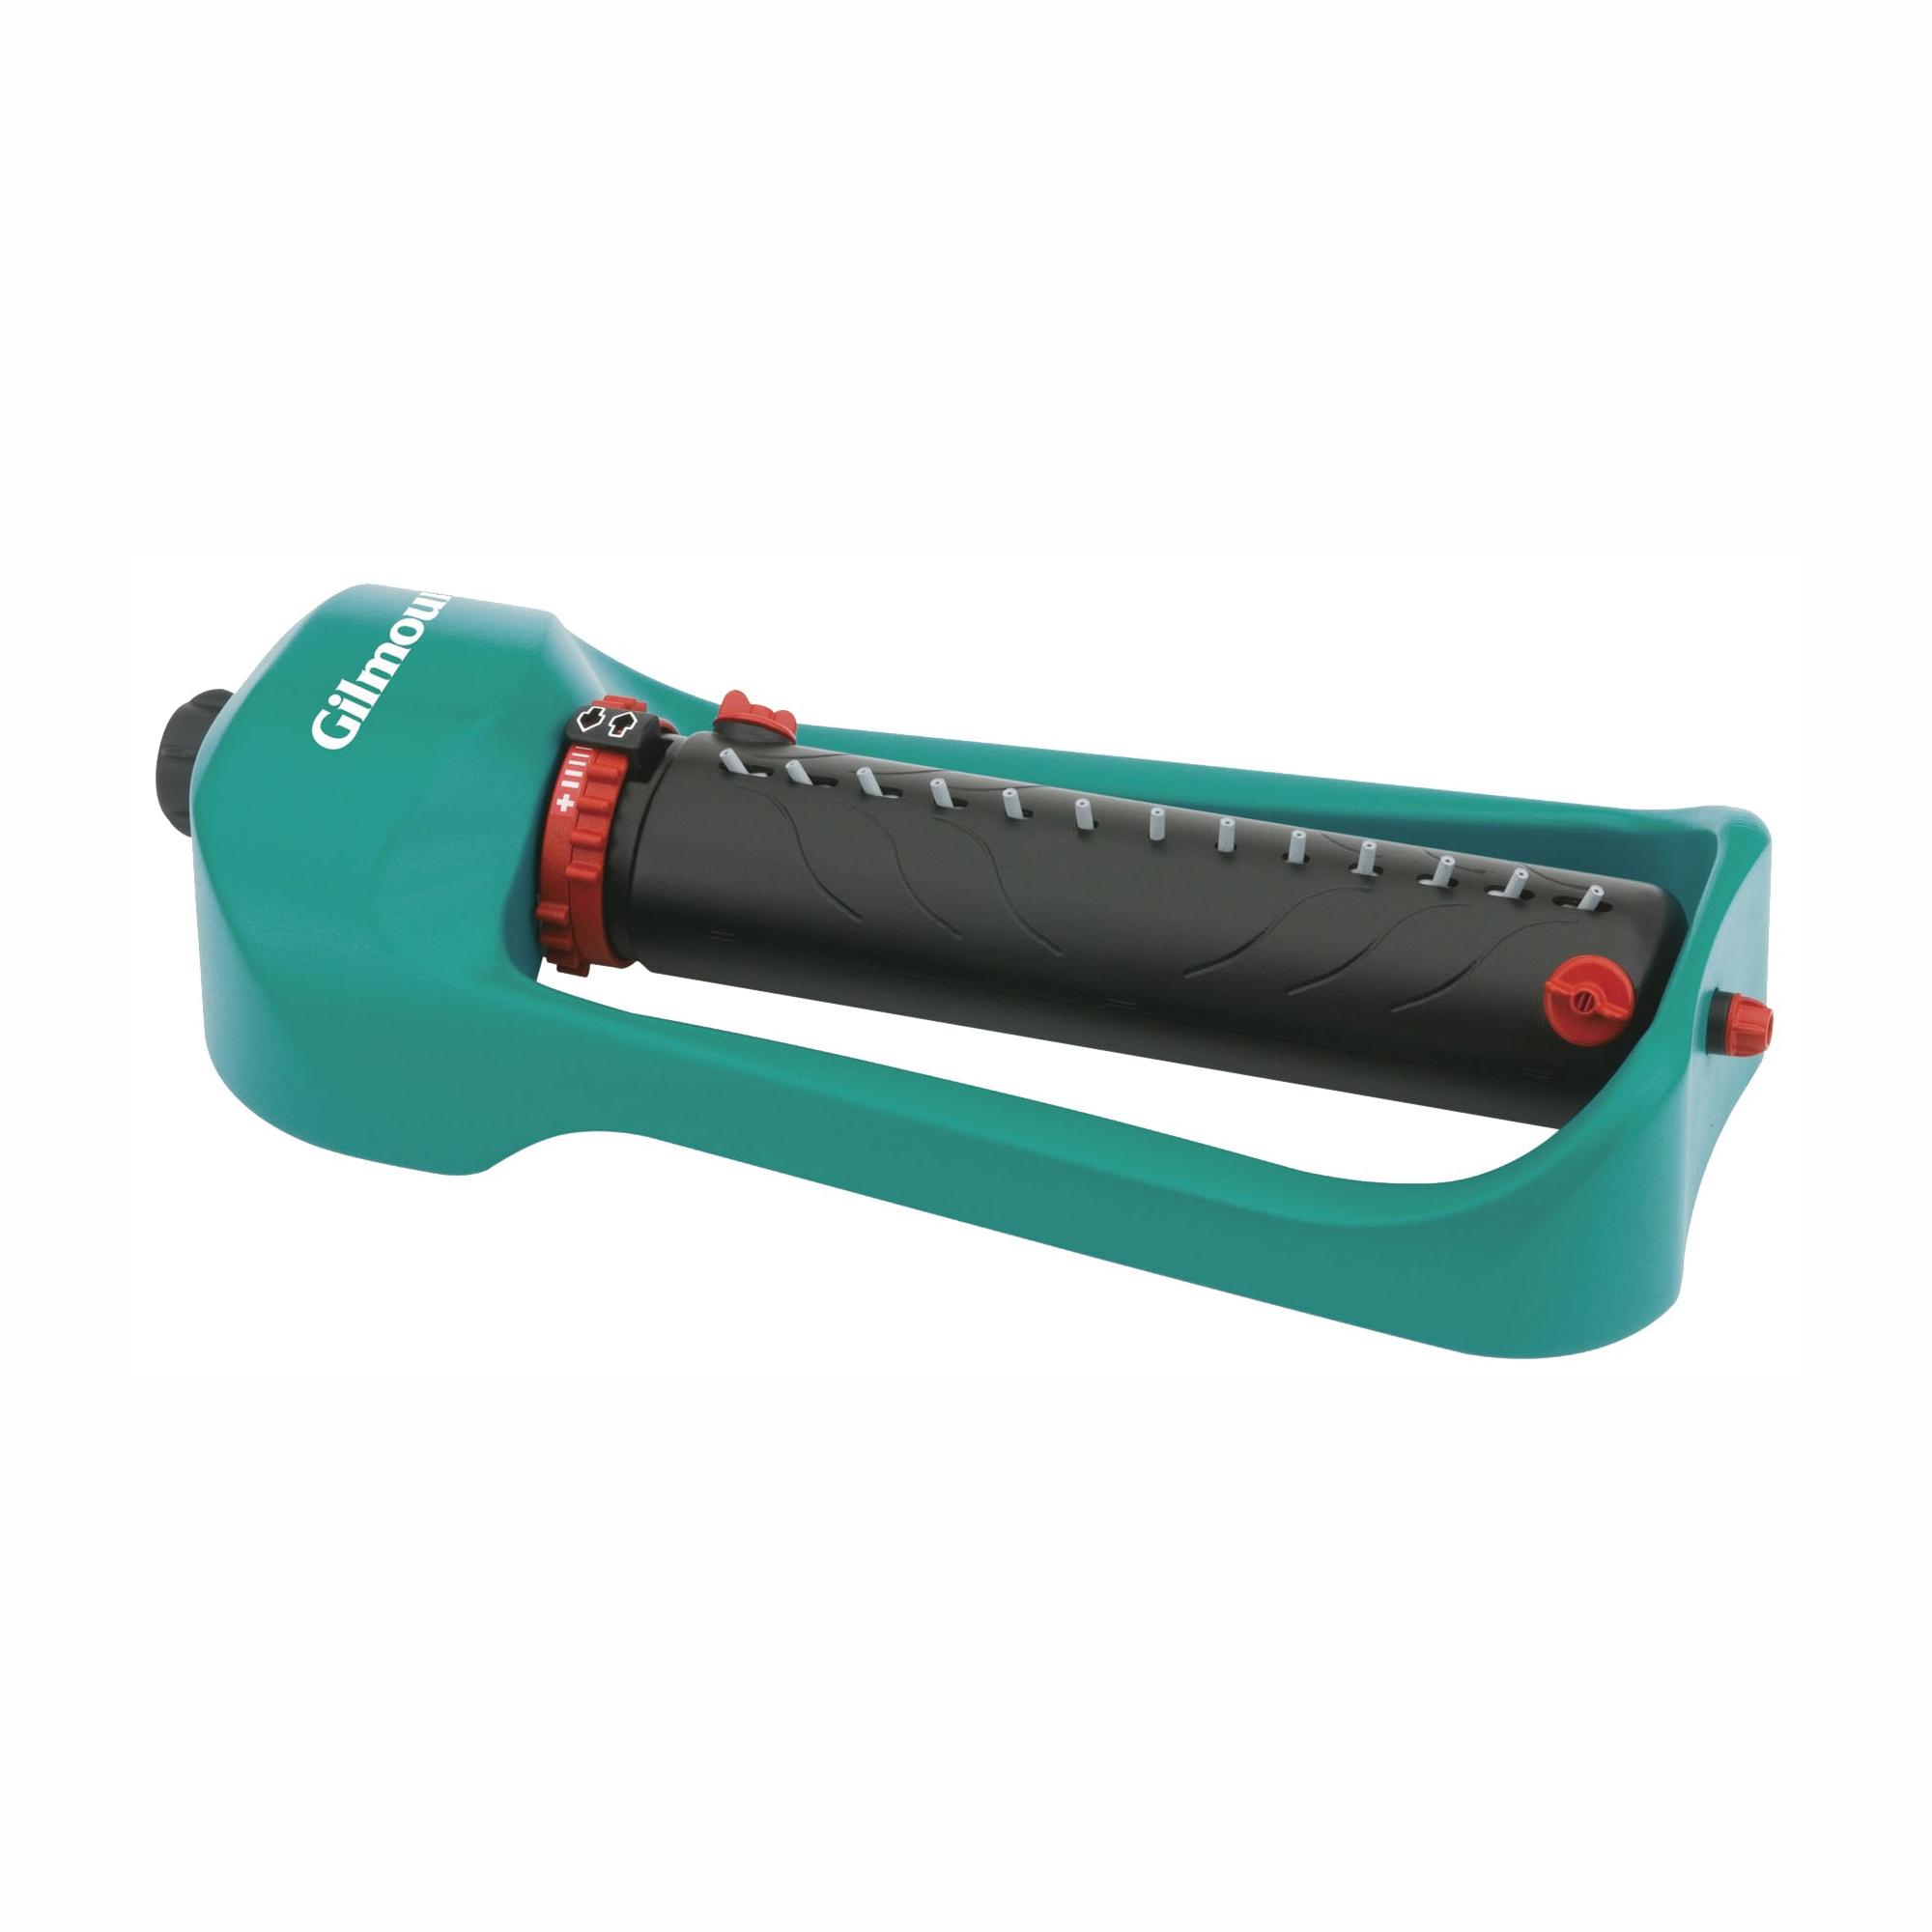 Picture of Gilmour 7800PV Oscillating Sprinkler, Plastic